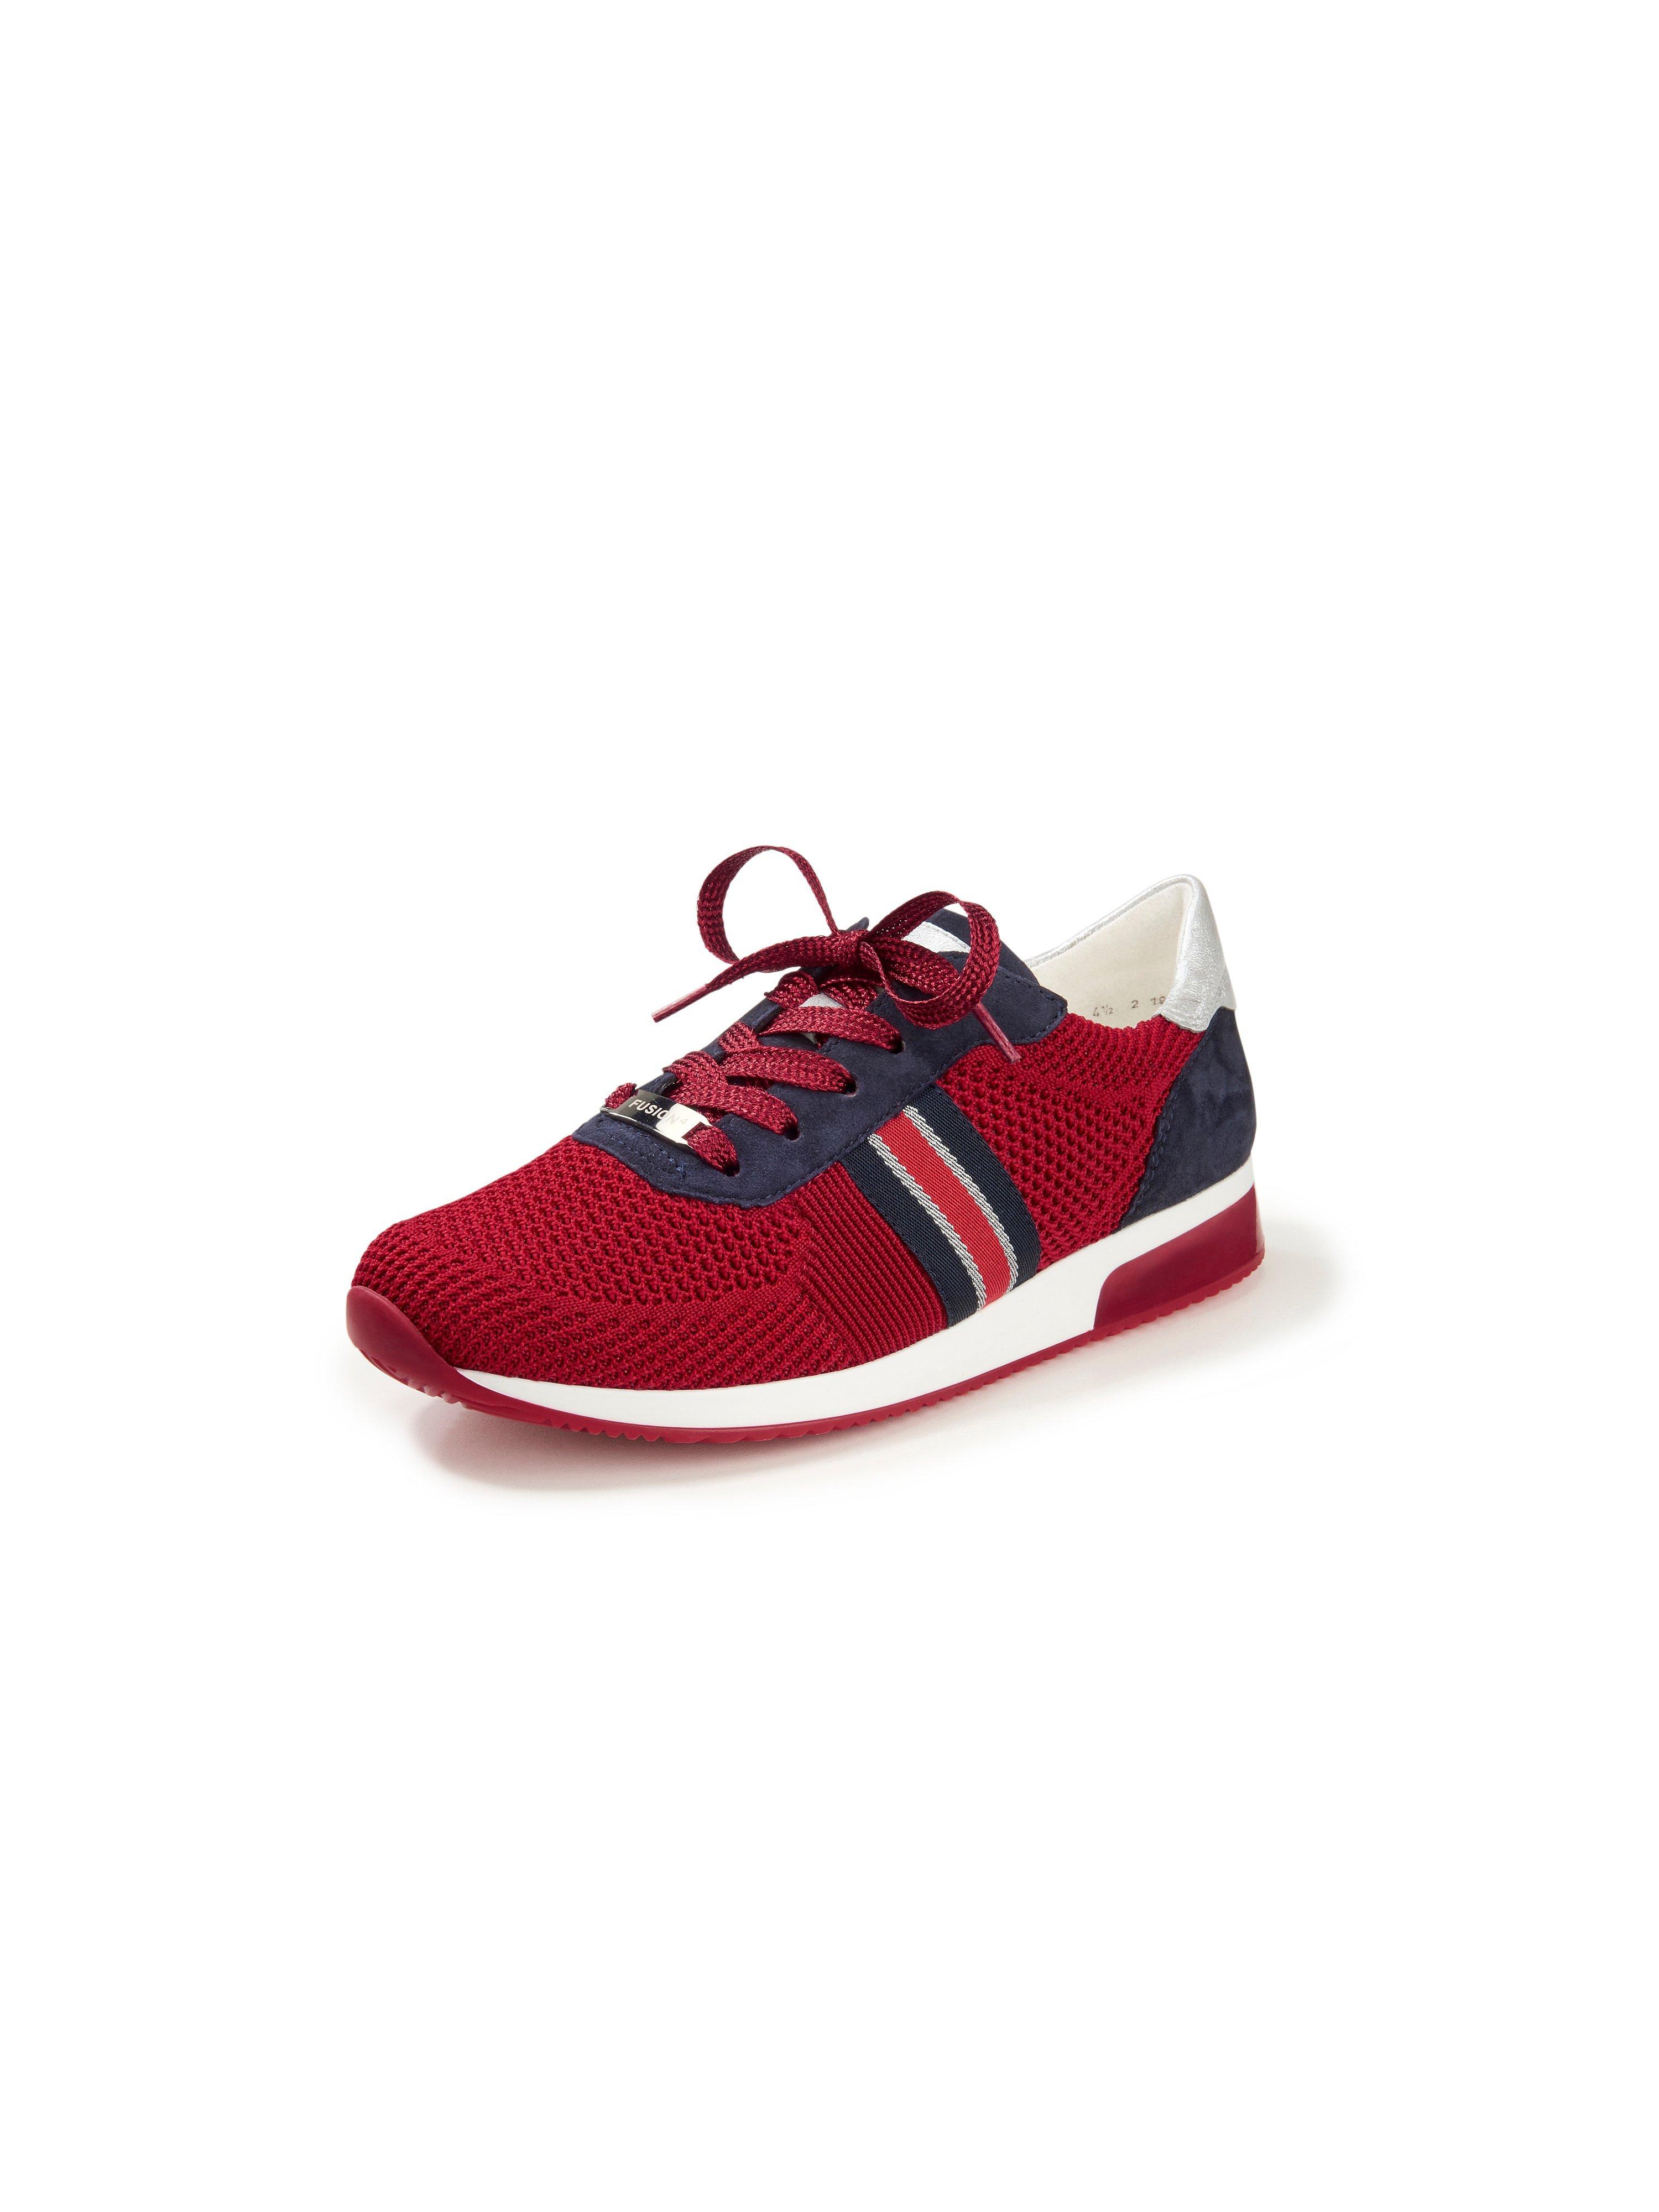 Sneakers Lissabon Fusion4 van textielmateriaal Van ARA rood